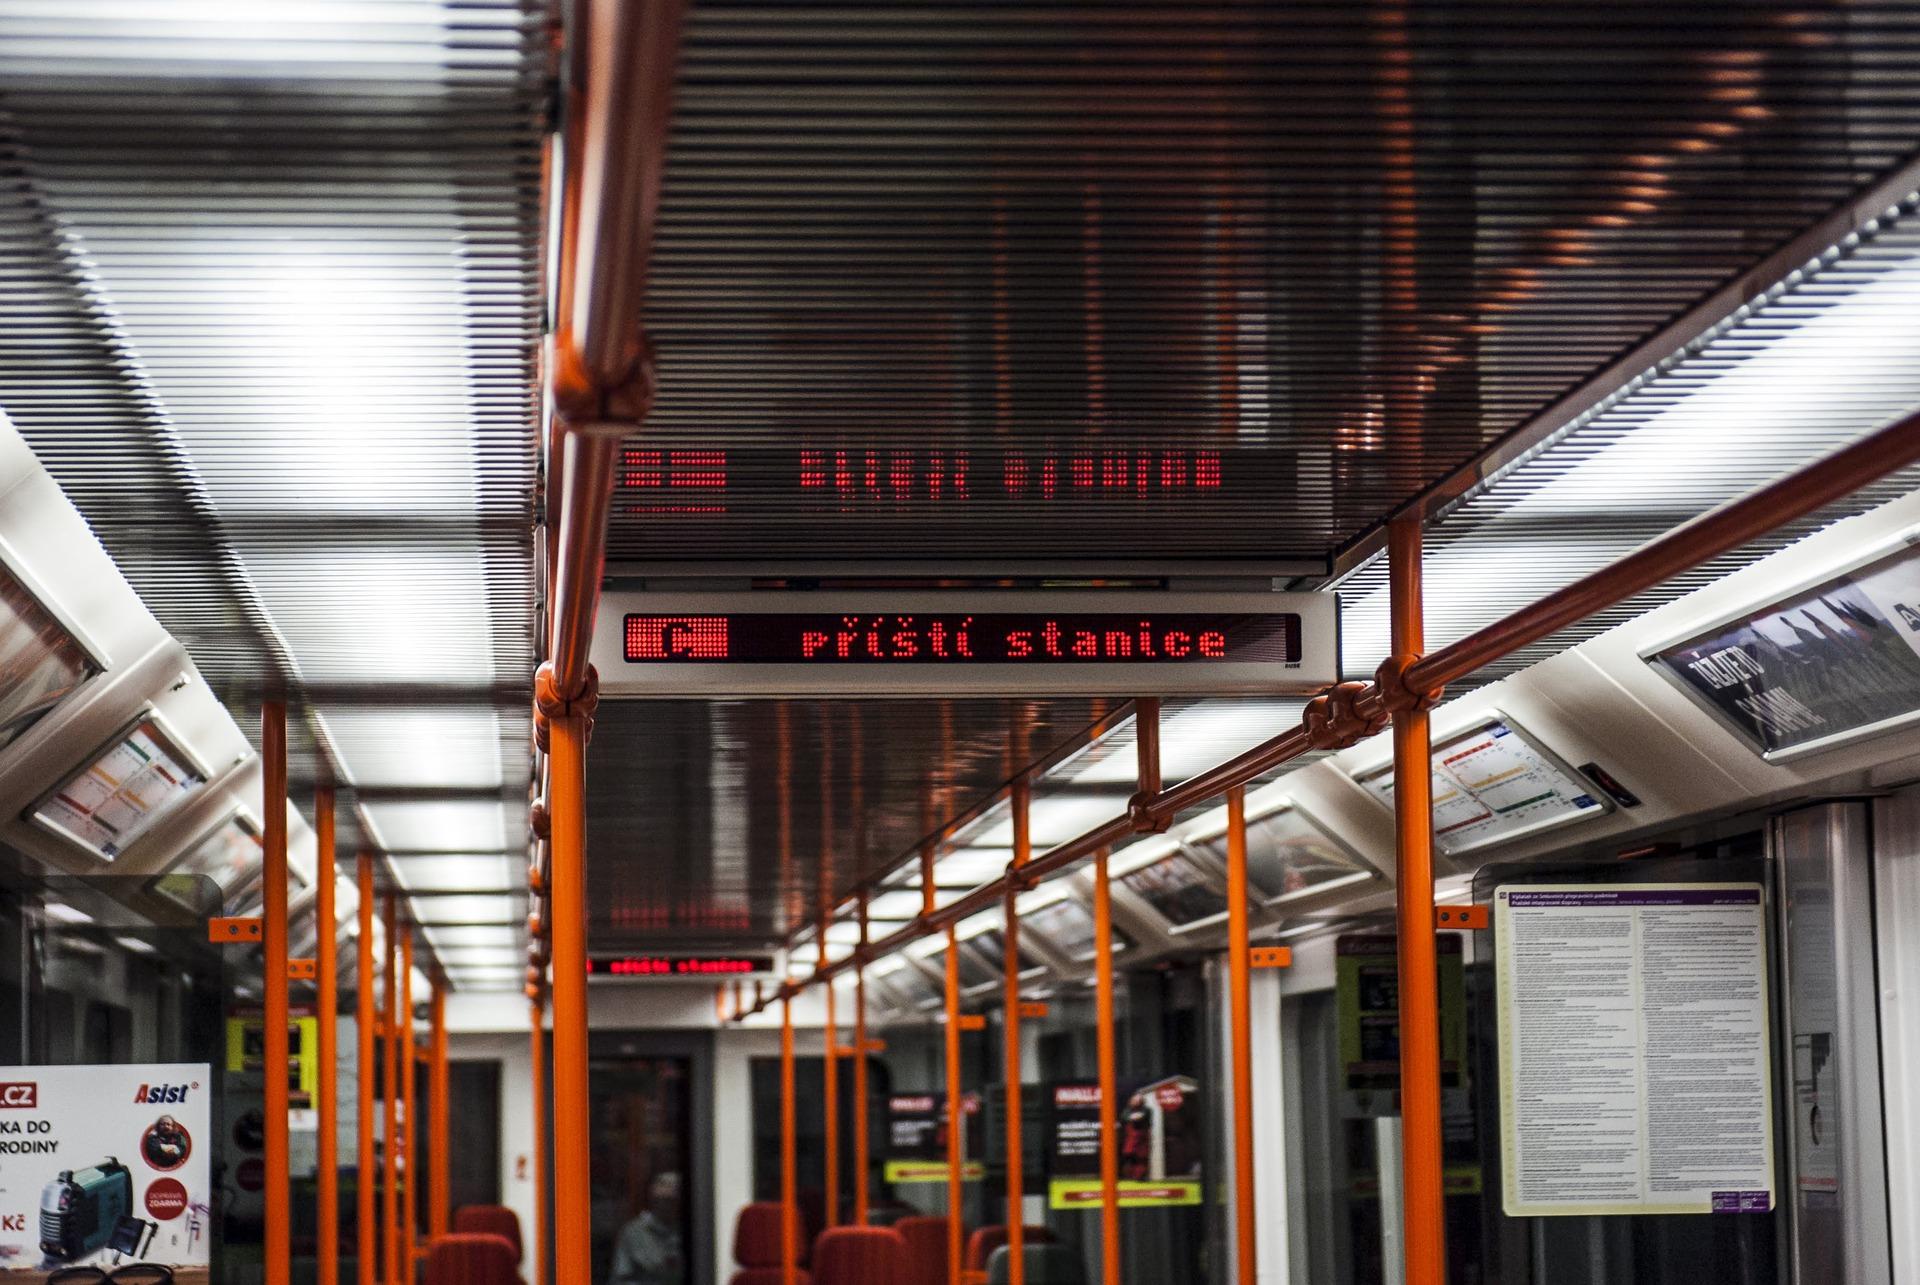 Metro de Praga - Horario, Mapa, Precio, Lineas